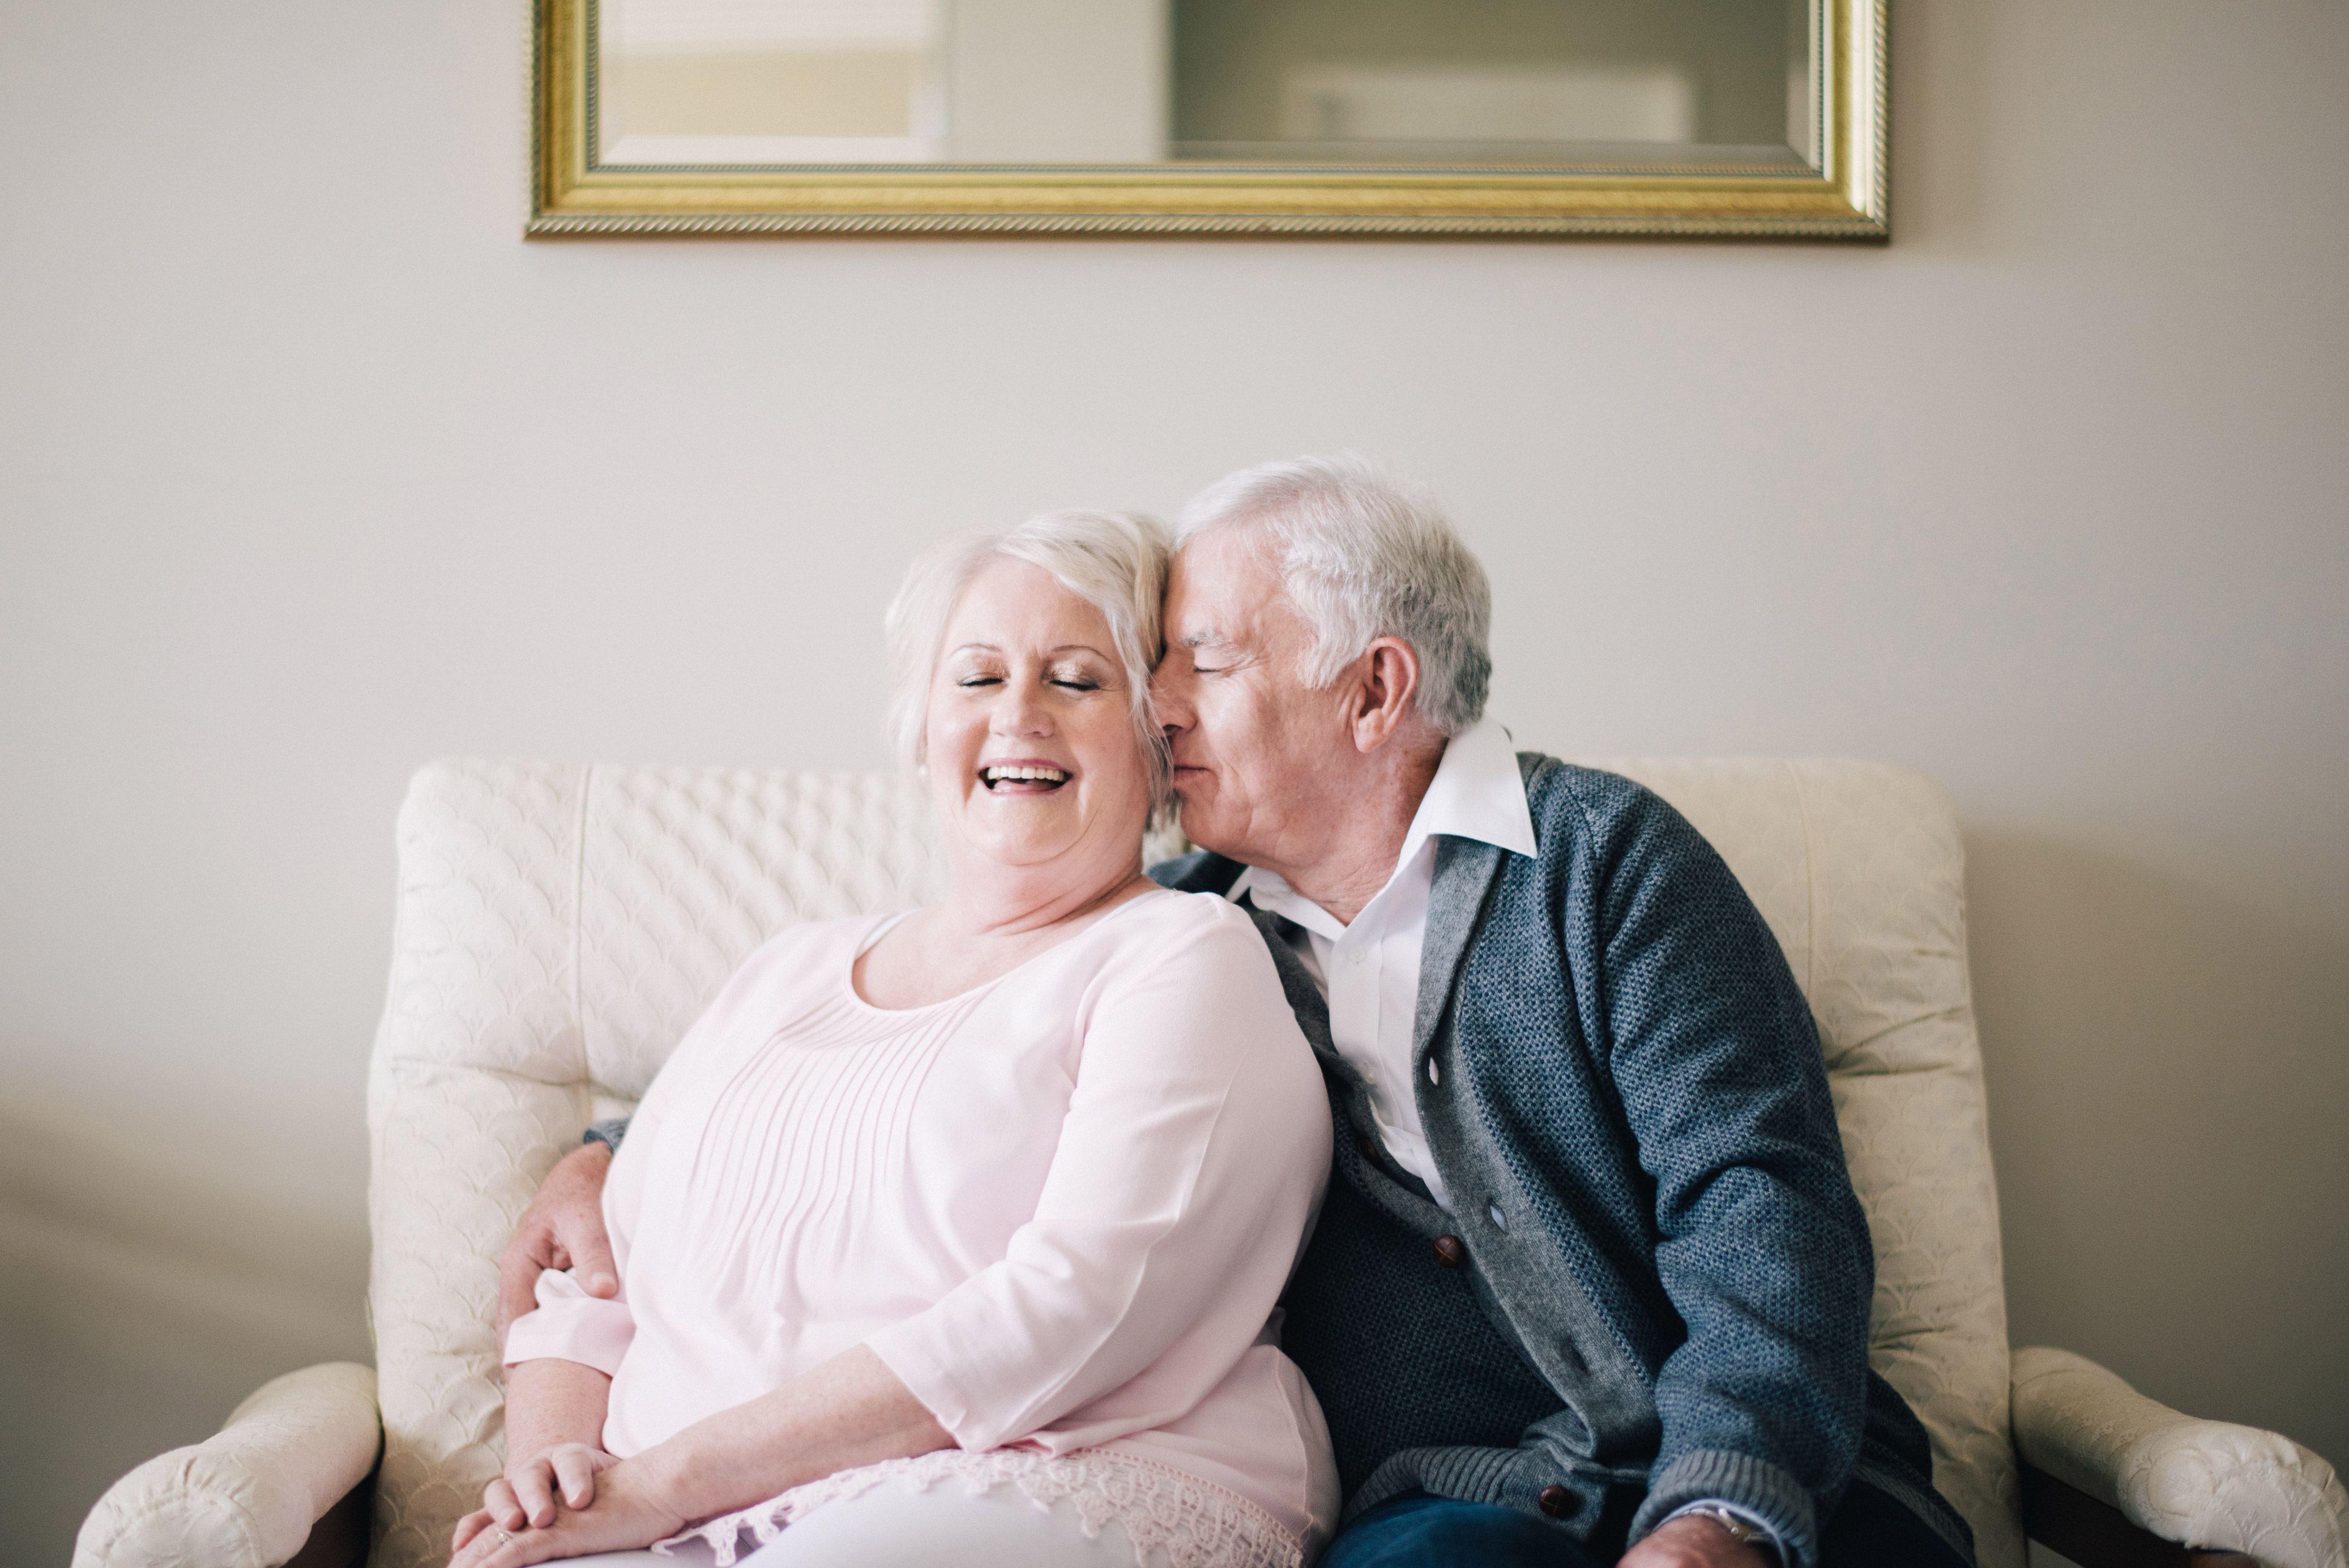 anniversary photo shoot andy margaret kiss on cheek